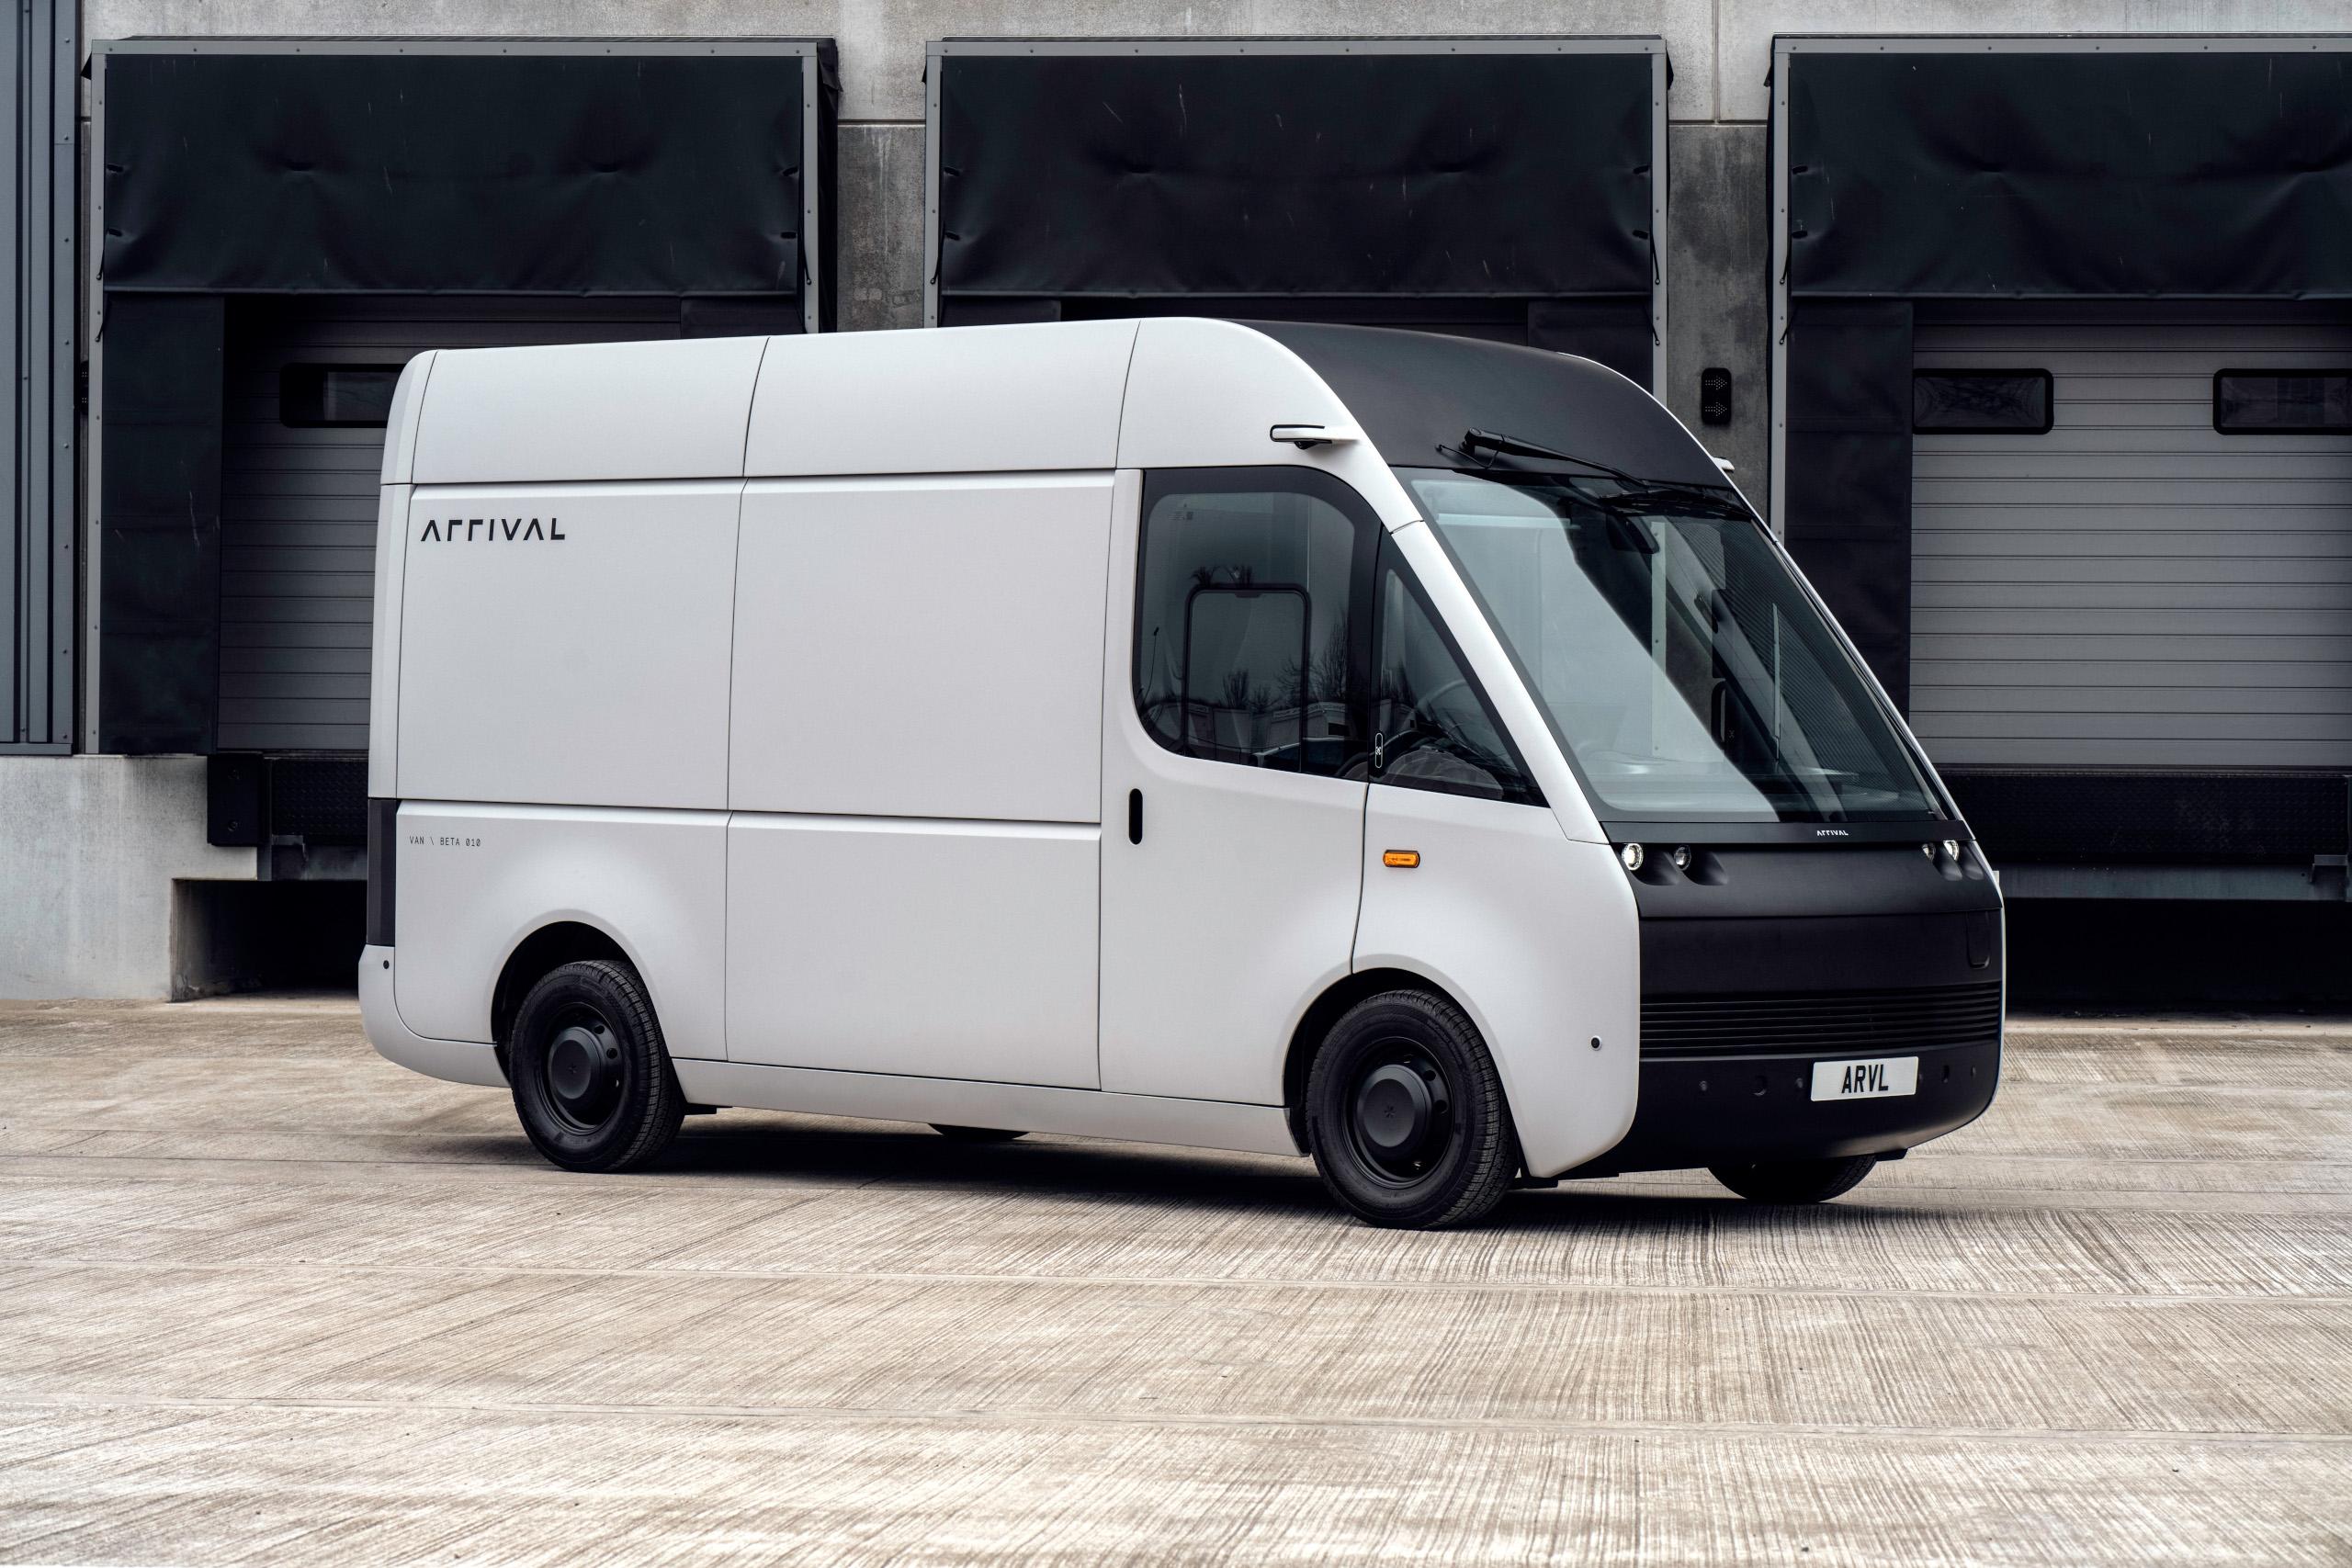 New UK Built Arrival Electric Panel Van Revealed